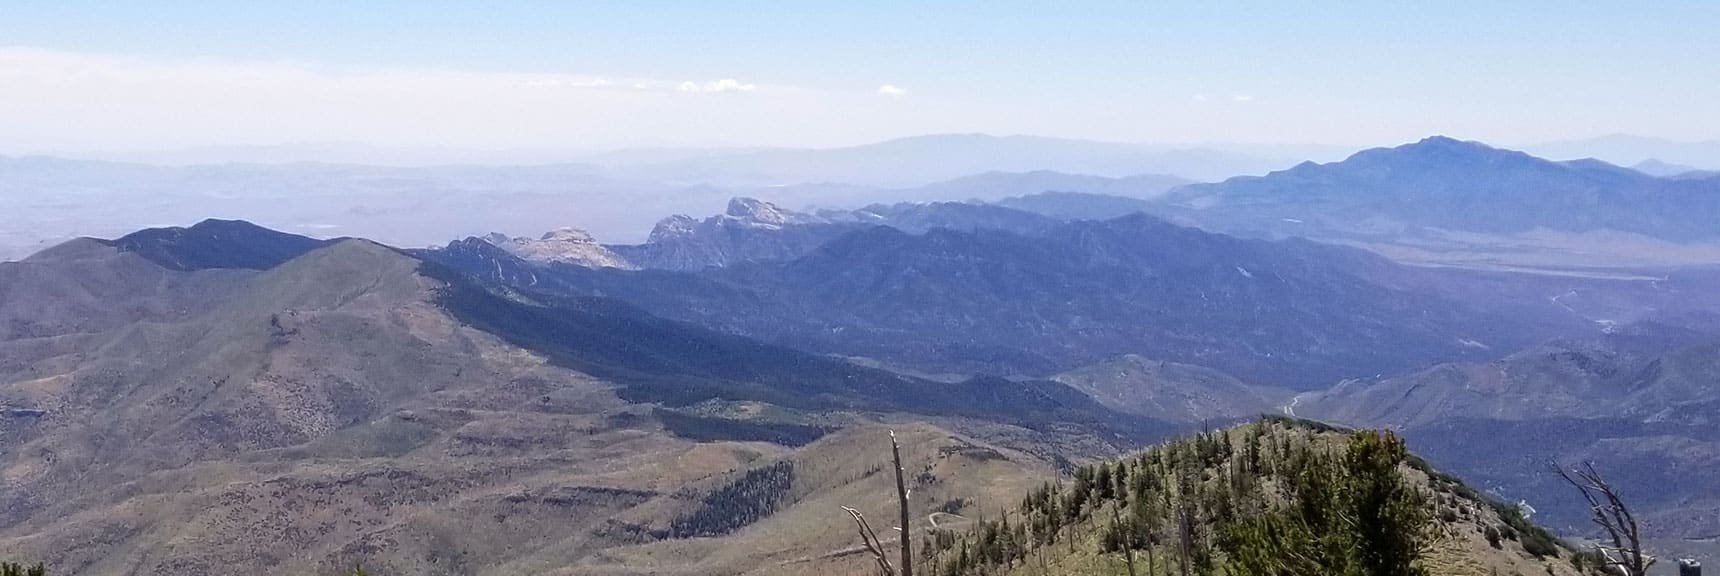 View of Goat Peak, Bridge Mountain, Mt. Wilson from Harris Mt Summit, Nevada